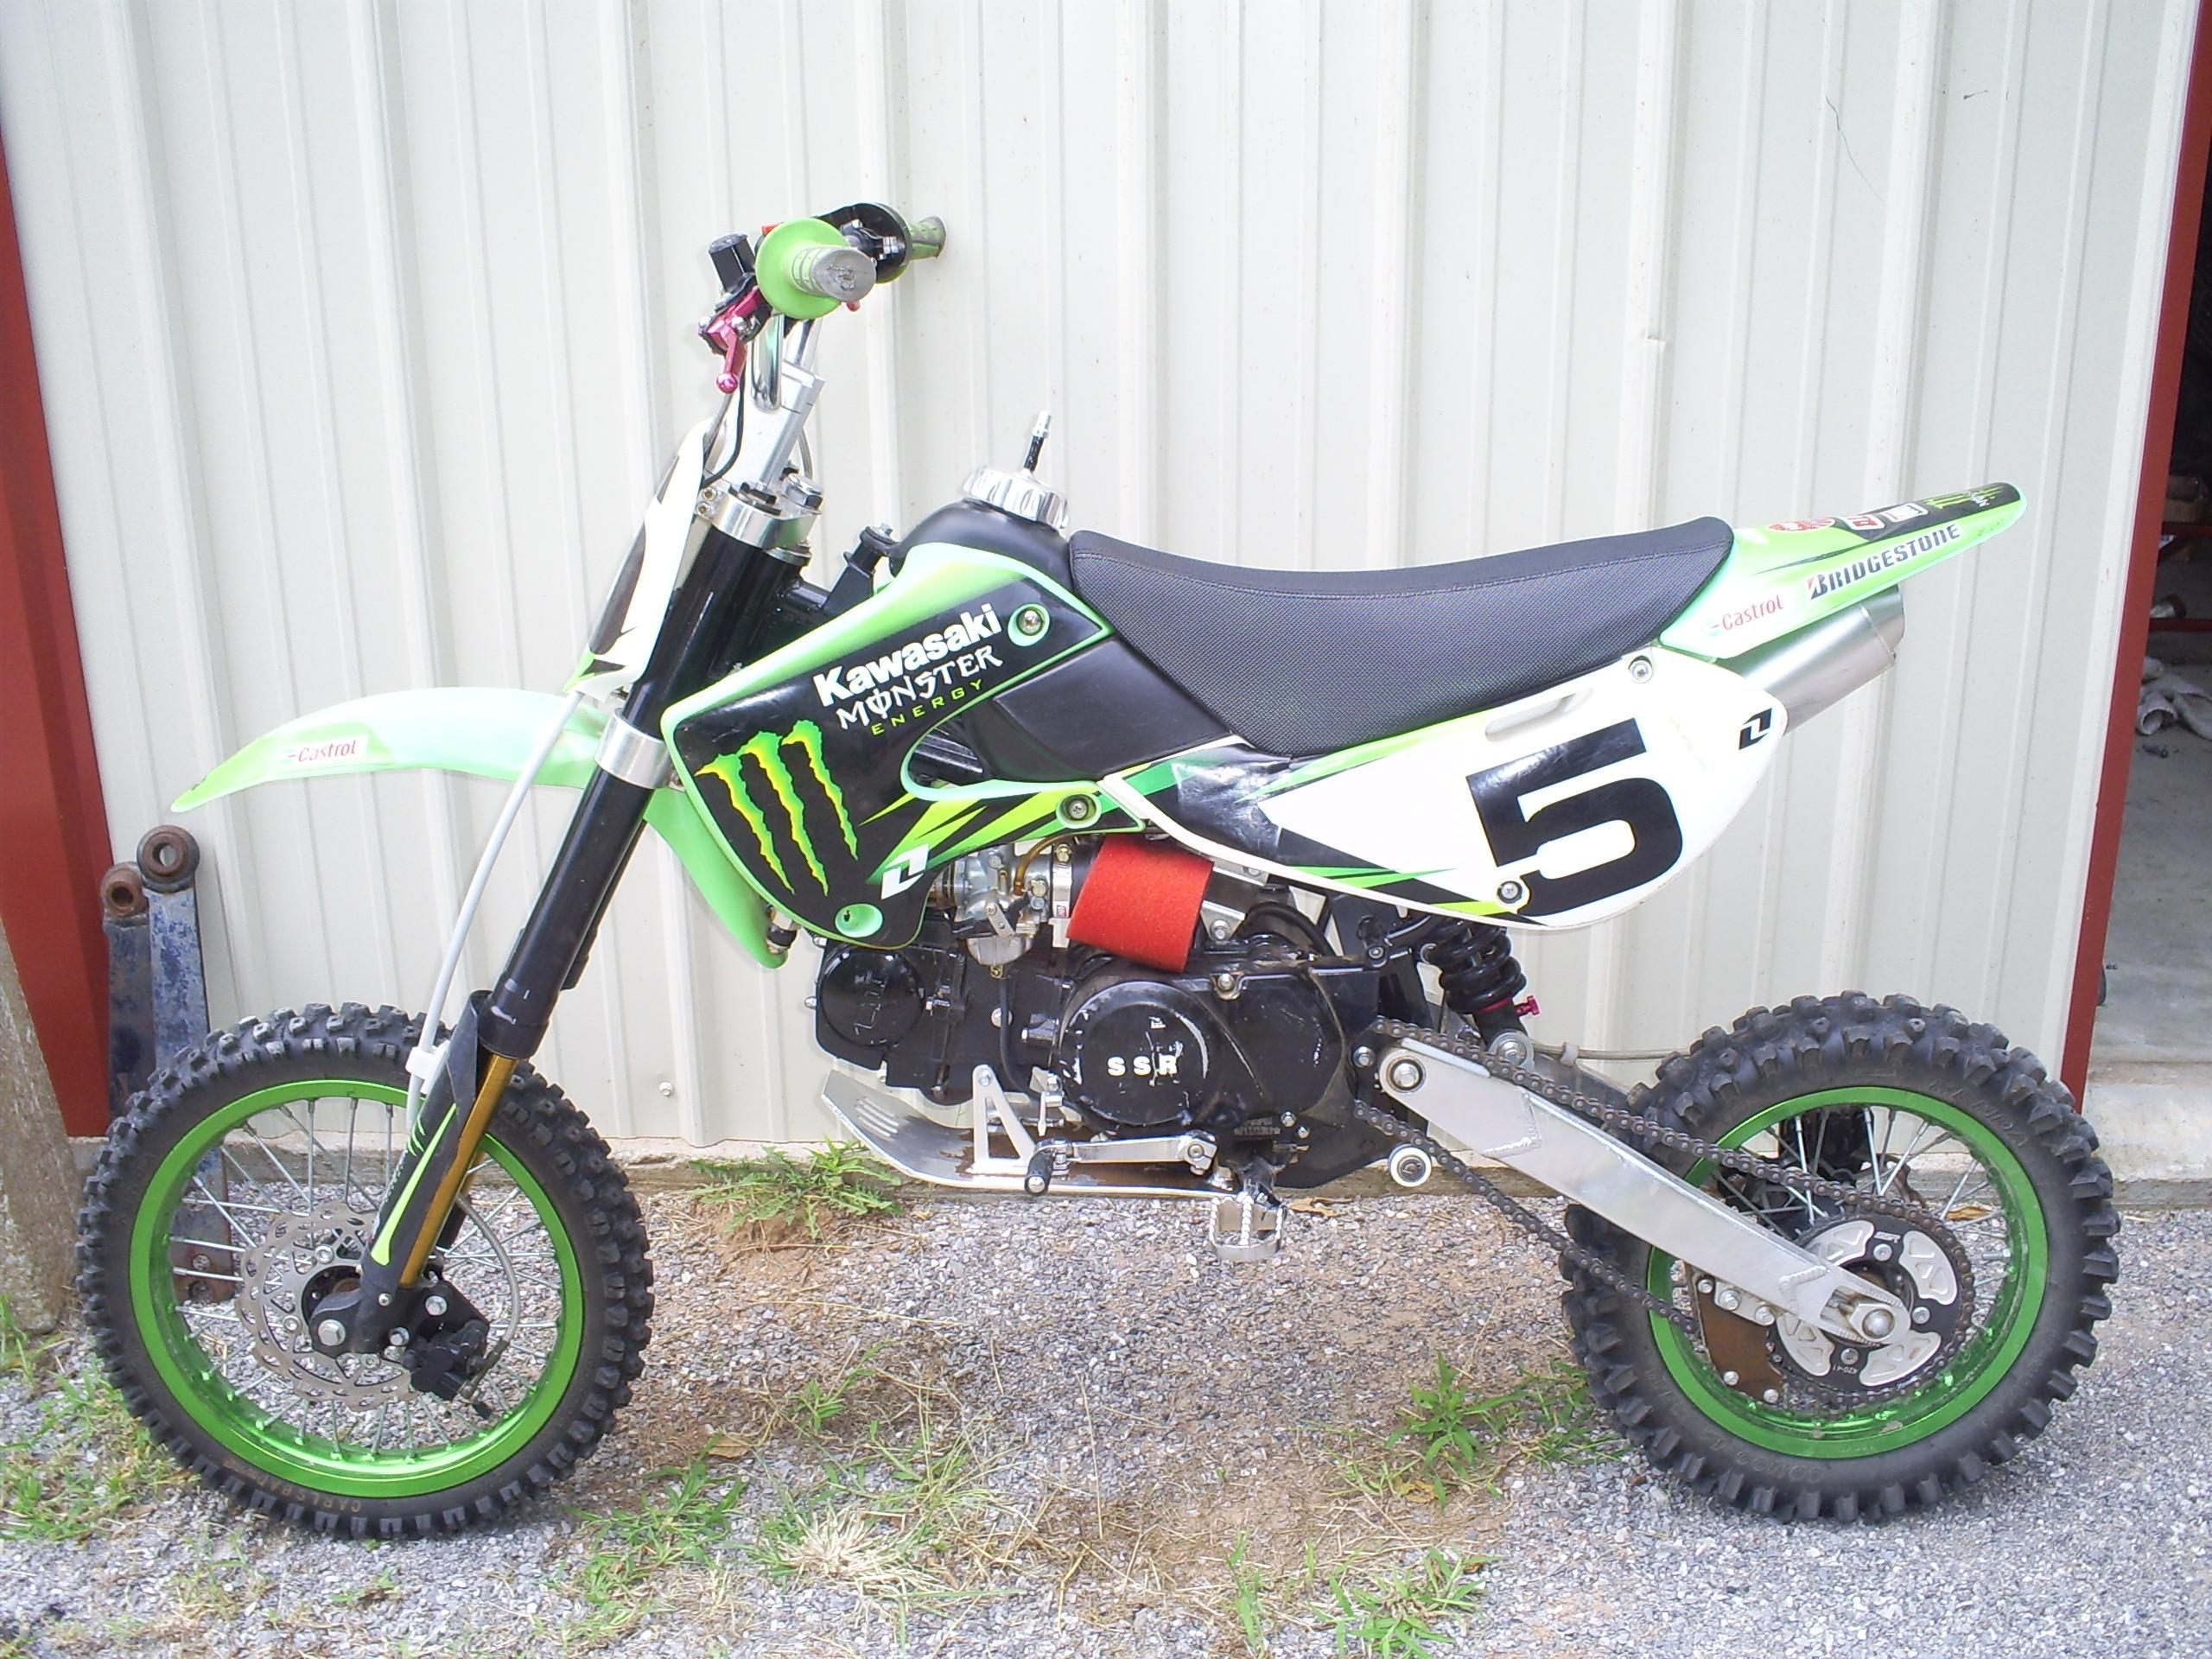 Ssr Pit Bike 150cc